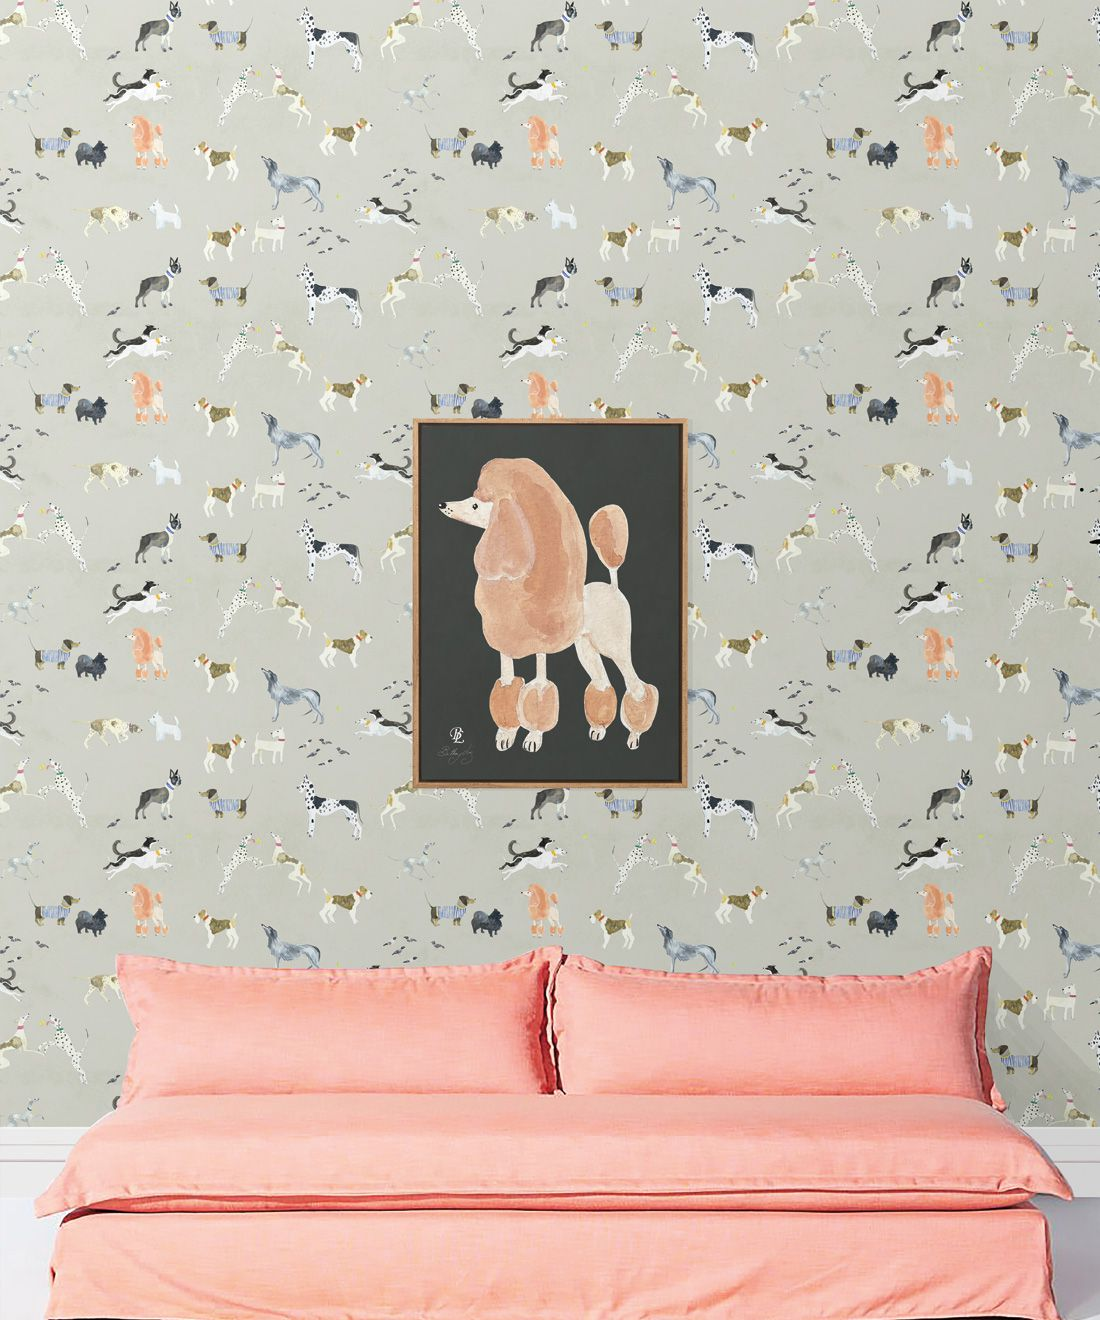 Doggies Wallpaper •Dog Wallpaper •Beige • Insitu with salmon colored sofa